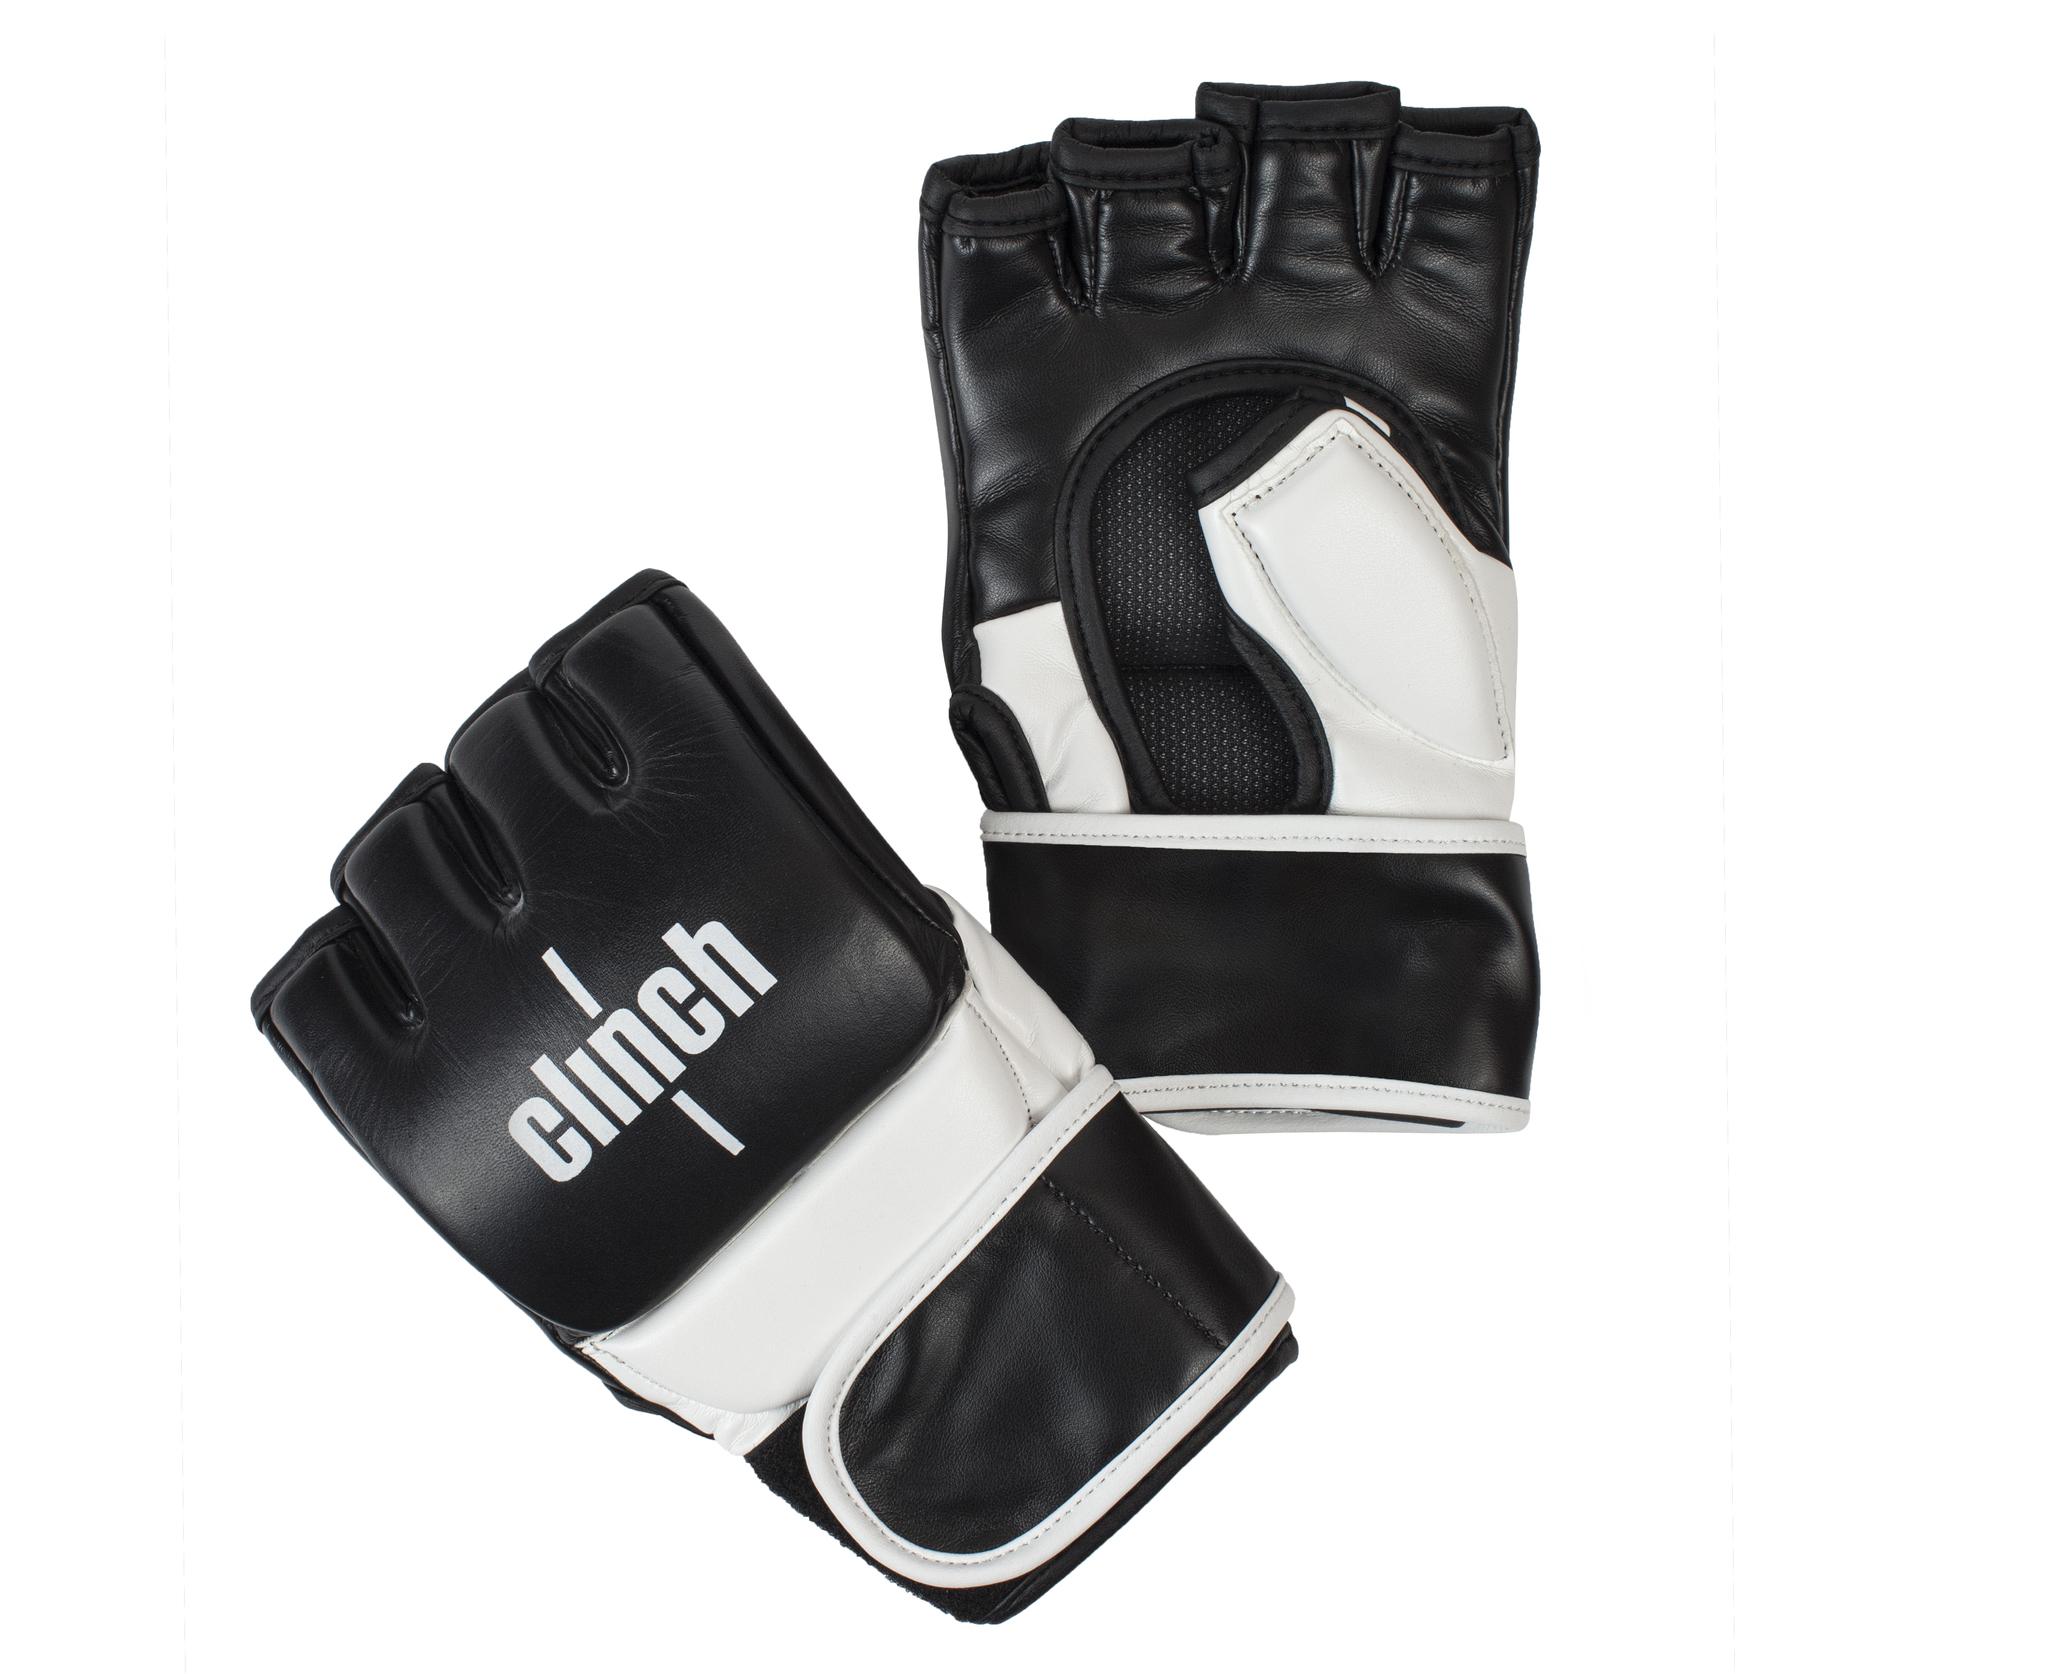 ММА перчатки Перчатки для смешанных единоборств Clinch Combat perchatki_dlya_smeshannykh_edinoborstv_clinch_combat_cherno_belye.jpg